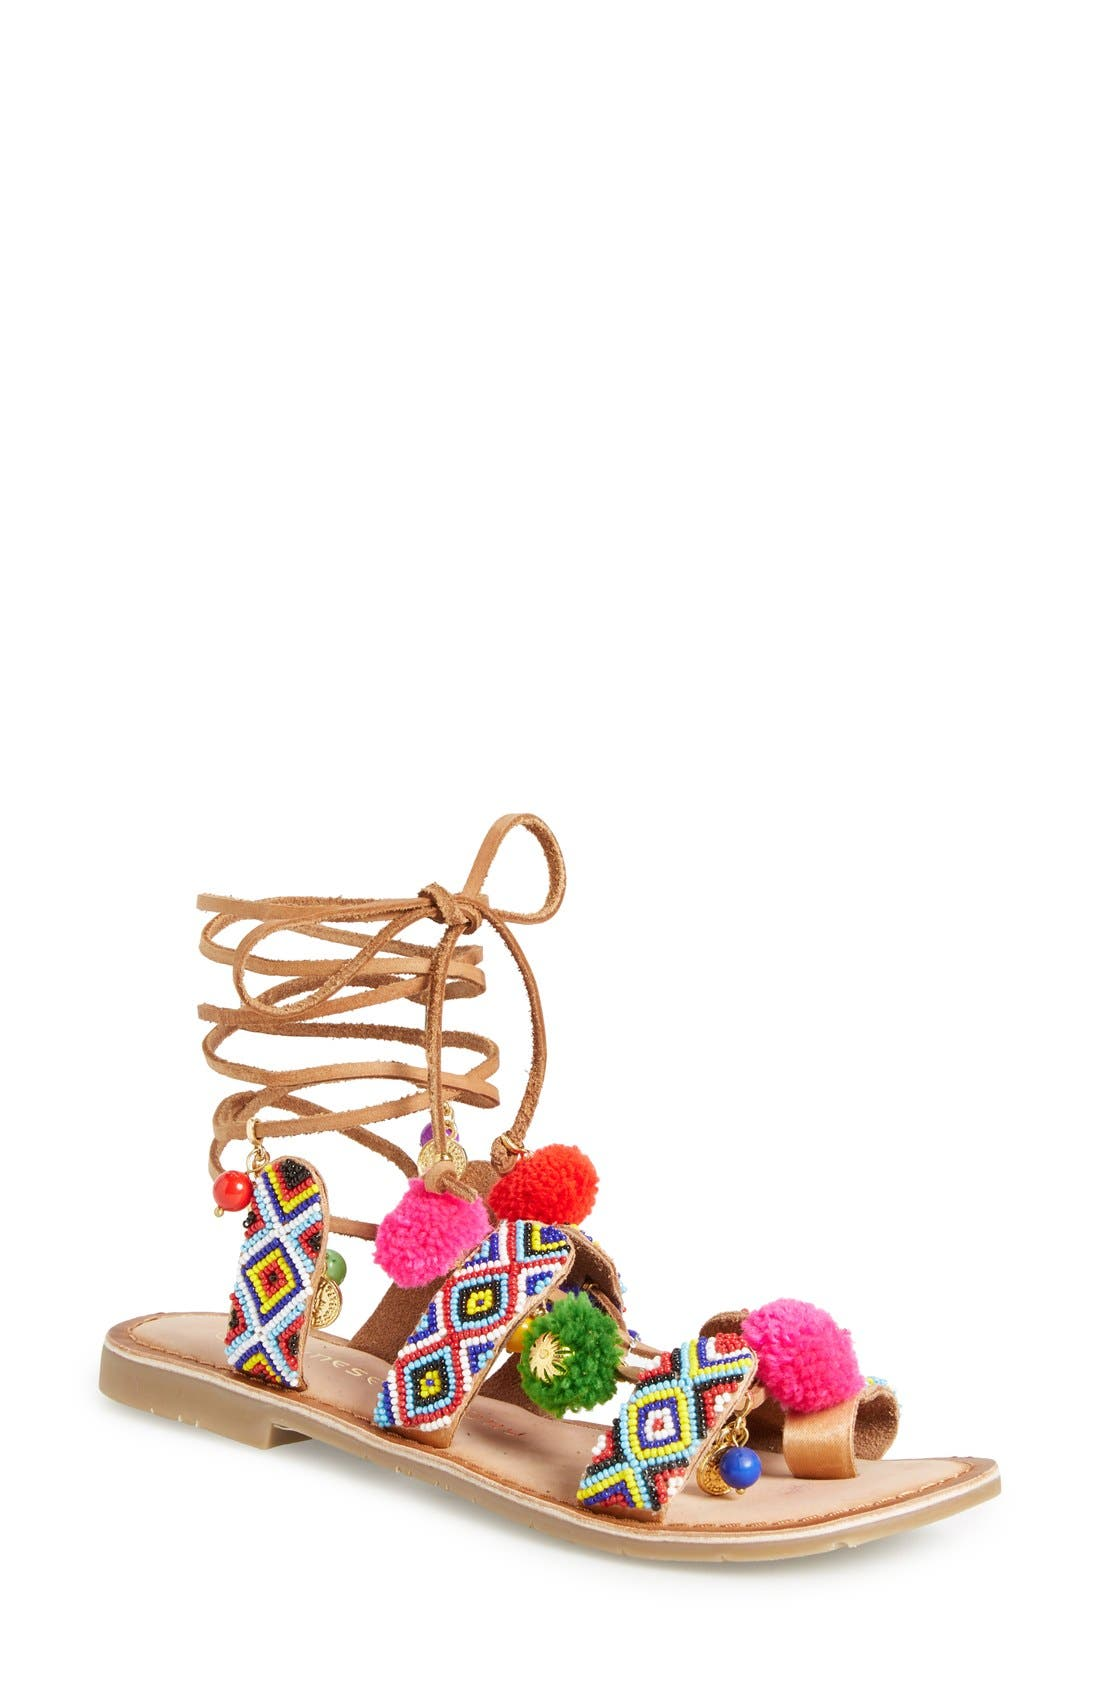 CHINESE LAUNDRY 'Posh' Embellished Lace-Up Sandal, Main, color, 218